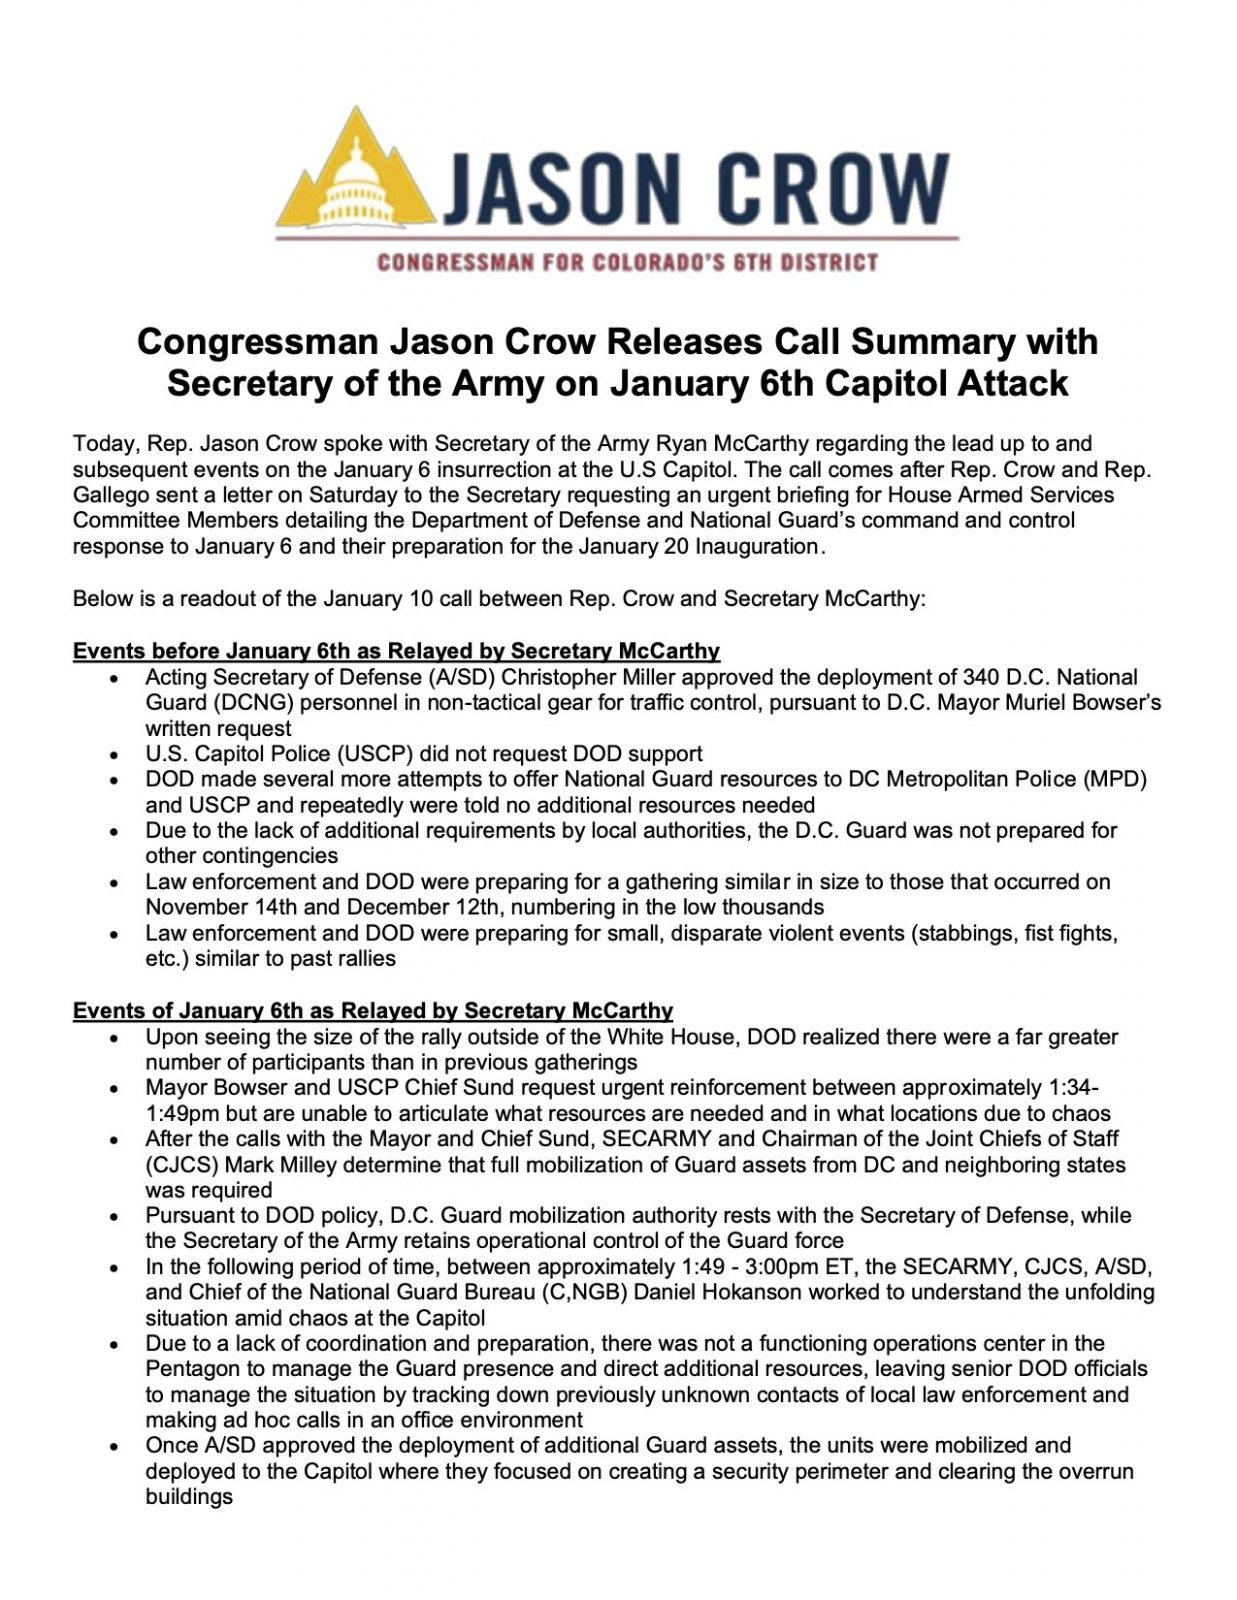 Jason Crow Notes 1.jpg